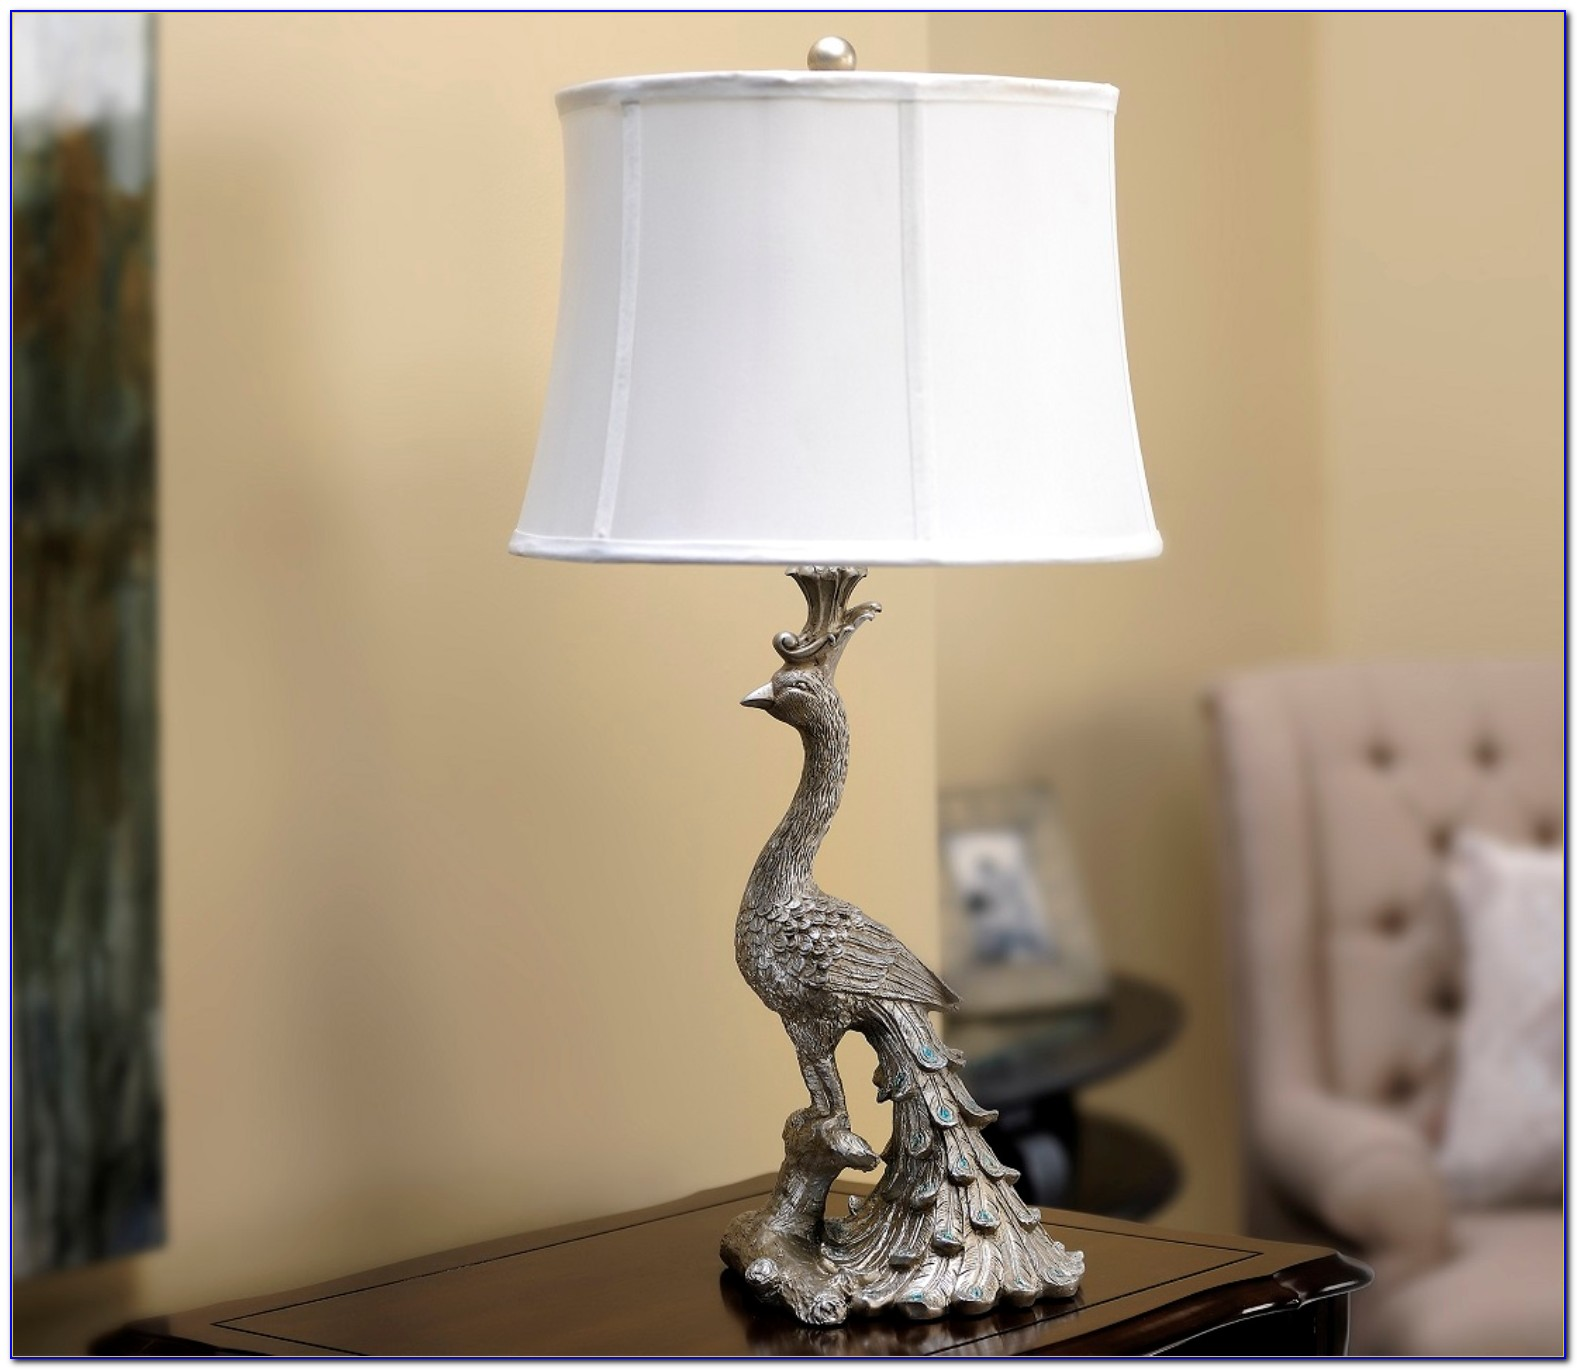 100 Watt Gooseneck Desk Lamp